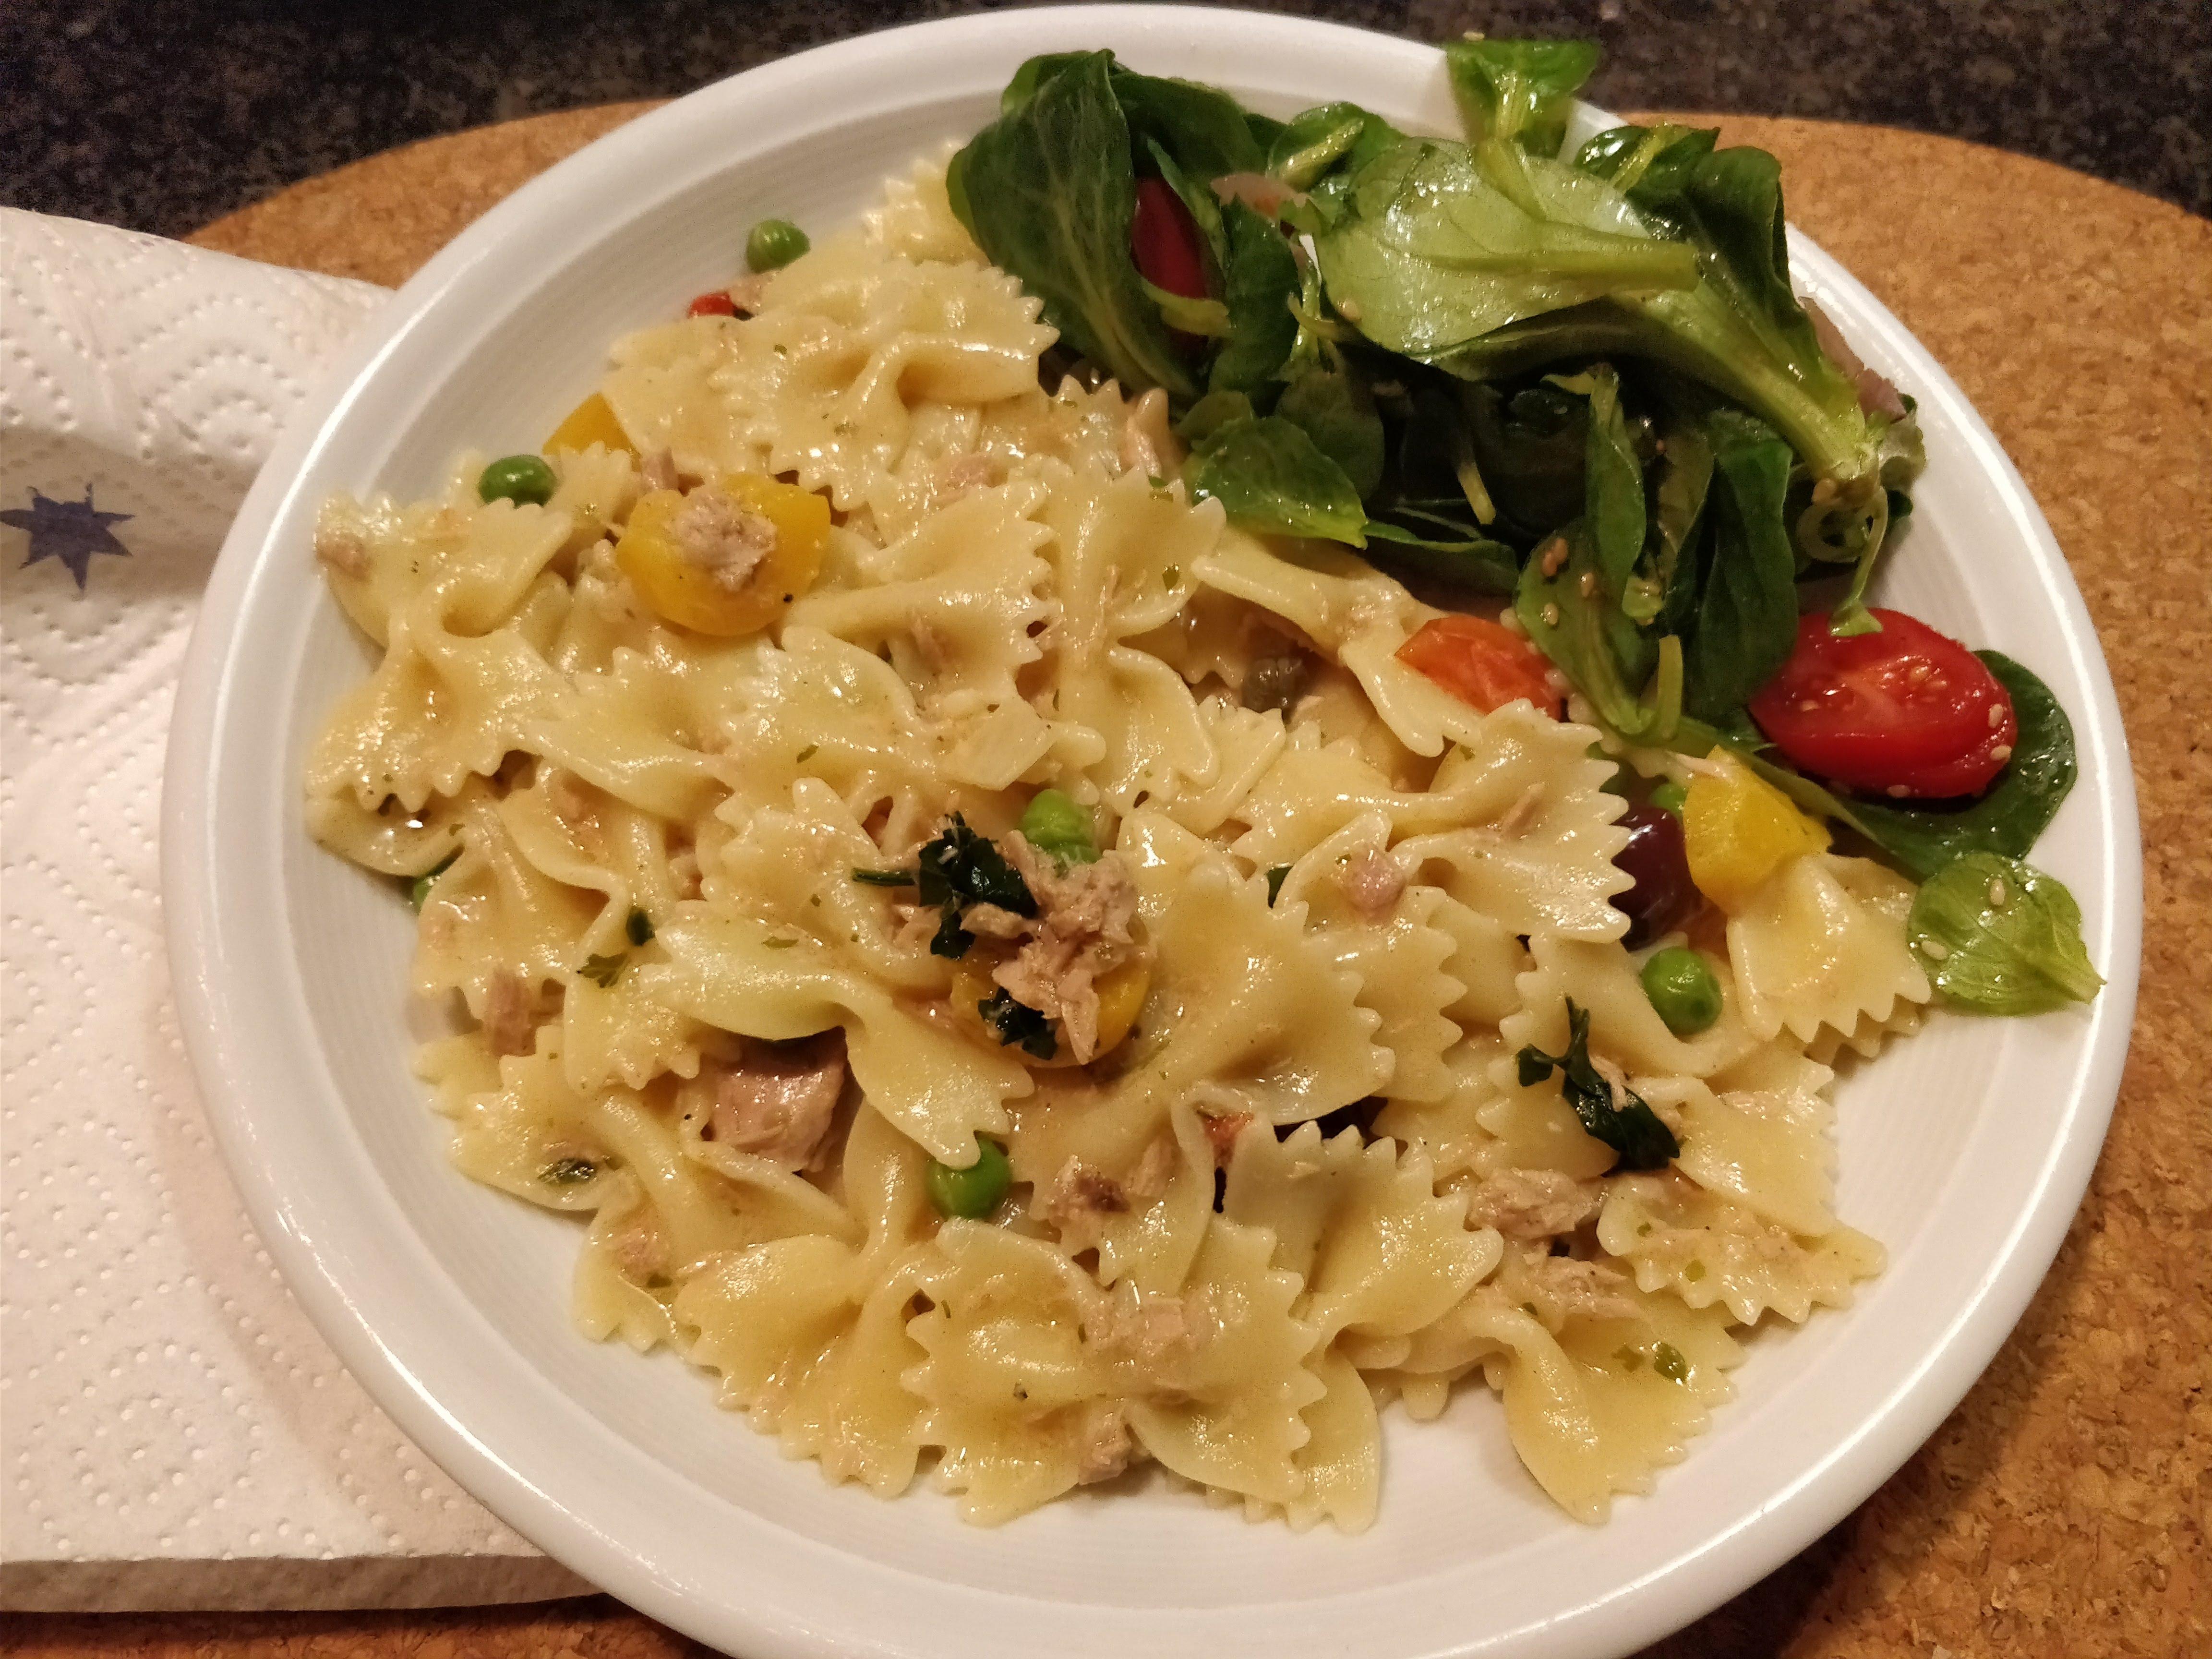 http://foodloader.net/nico_2017-12-17_farfalle-mit-thunfisch-sahne-sauce.jpg